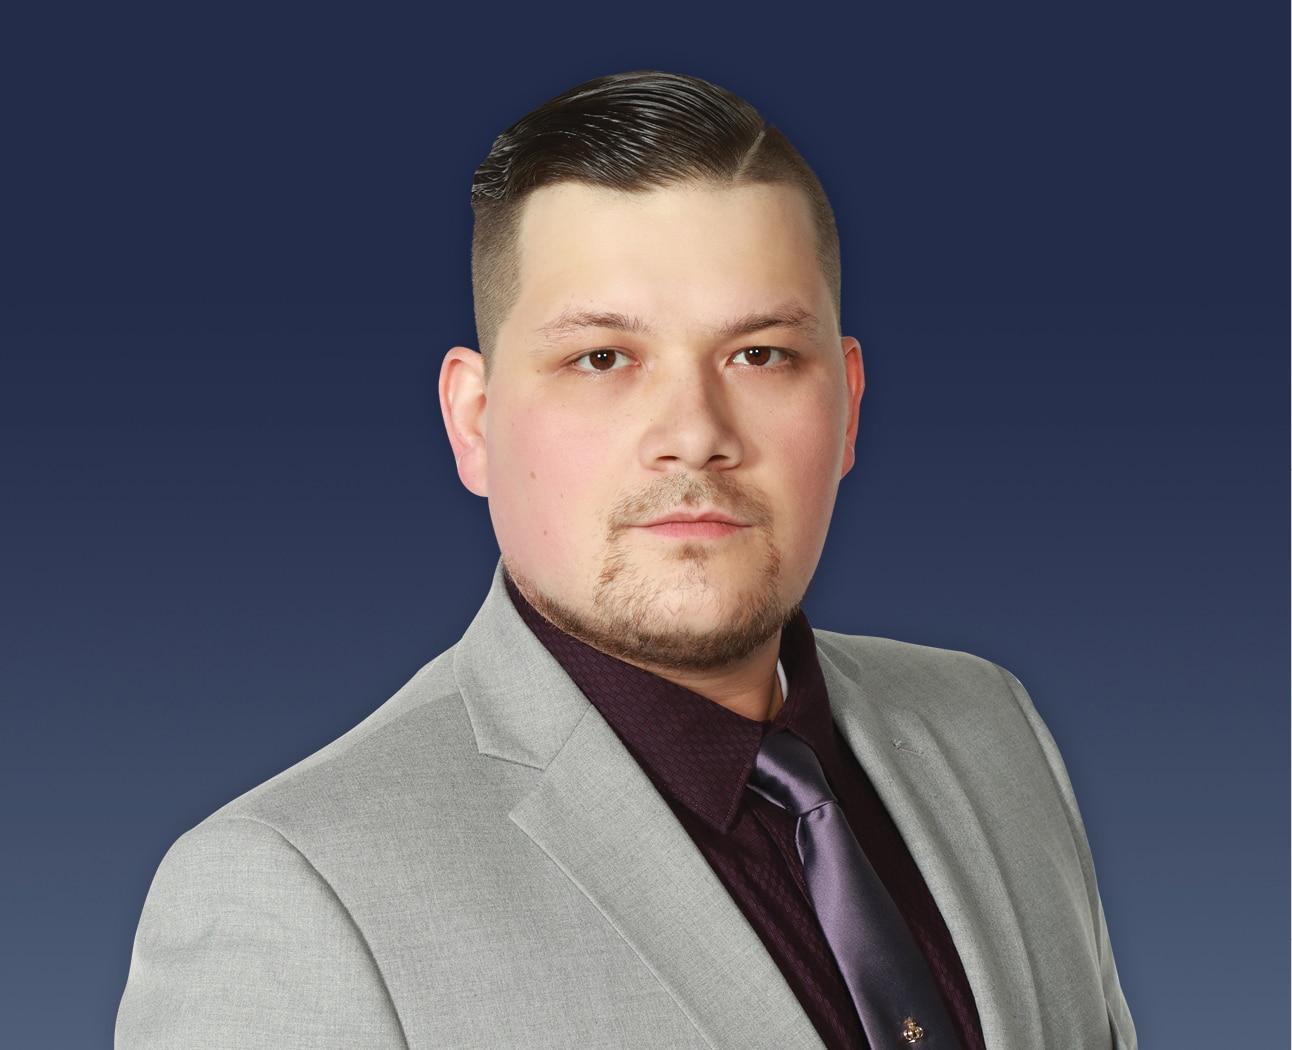 Attorney Roman Diveev